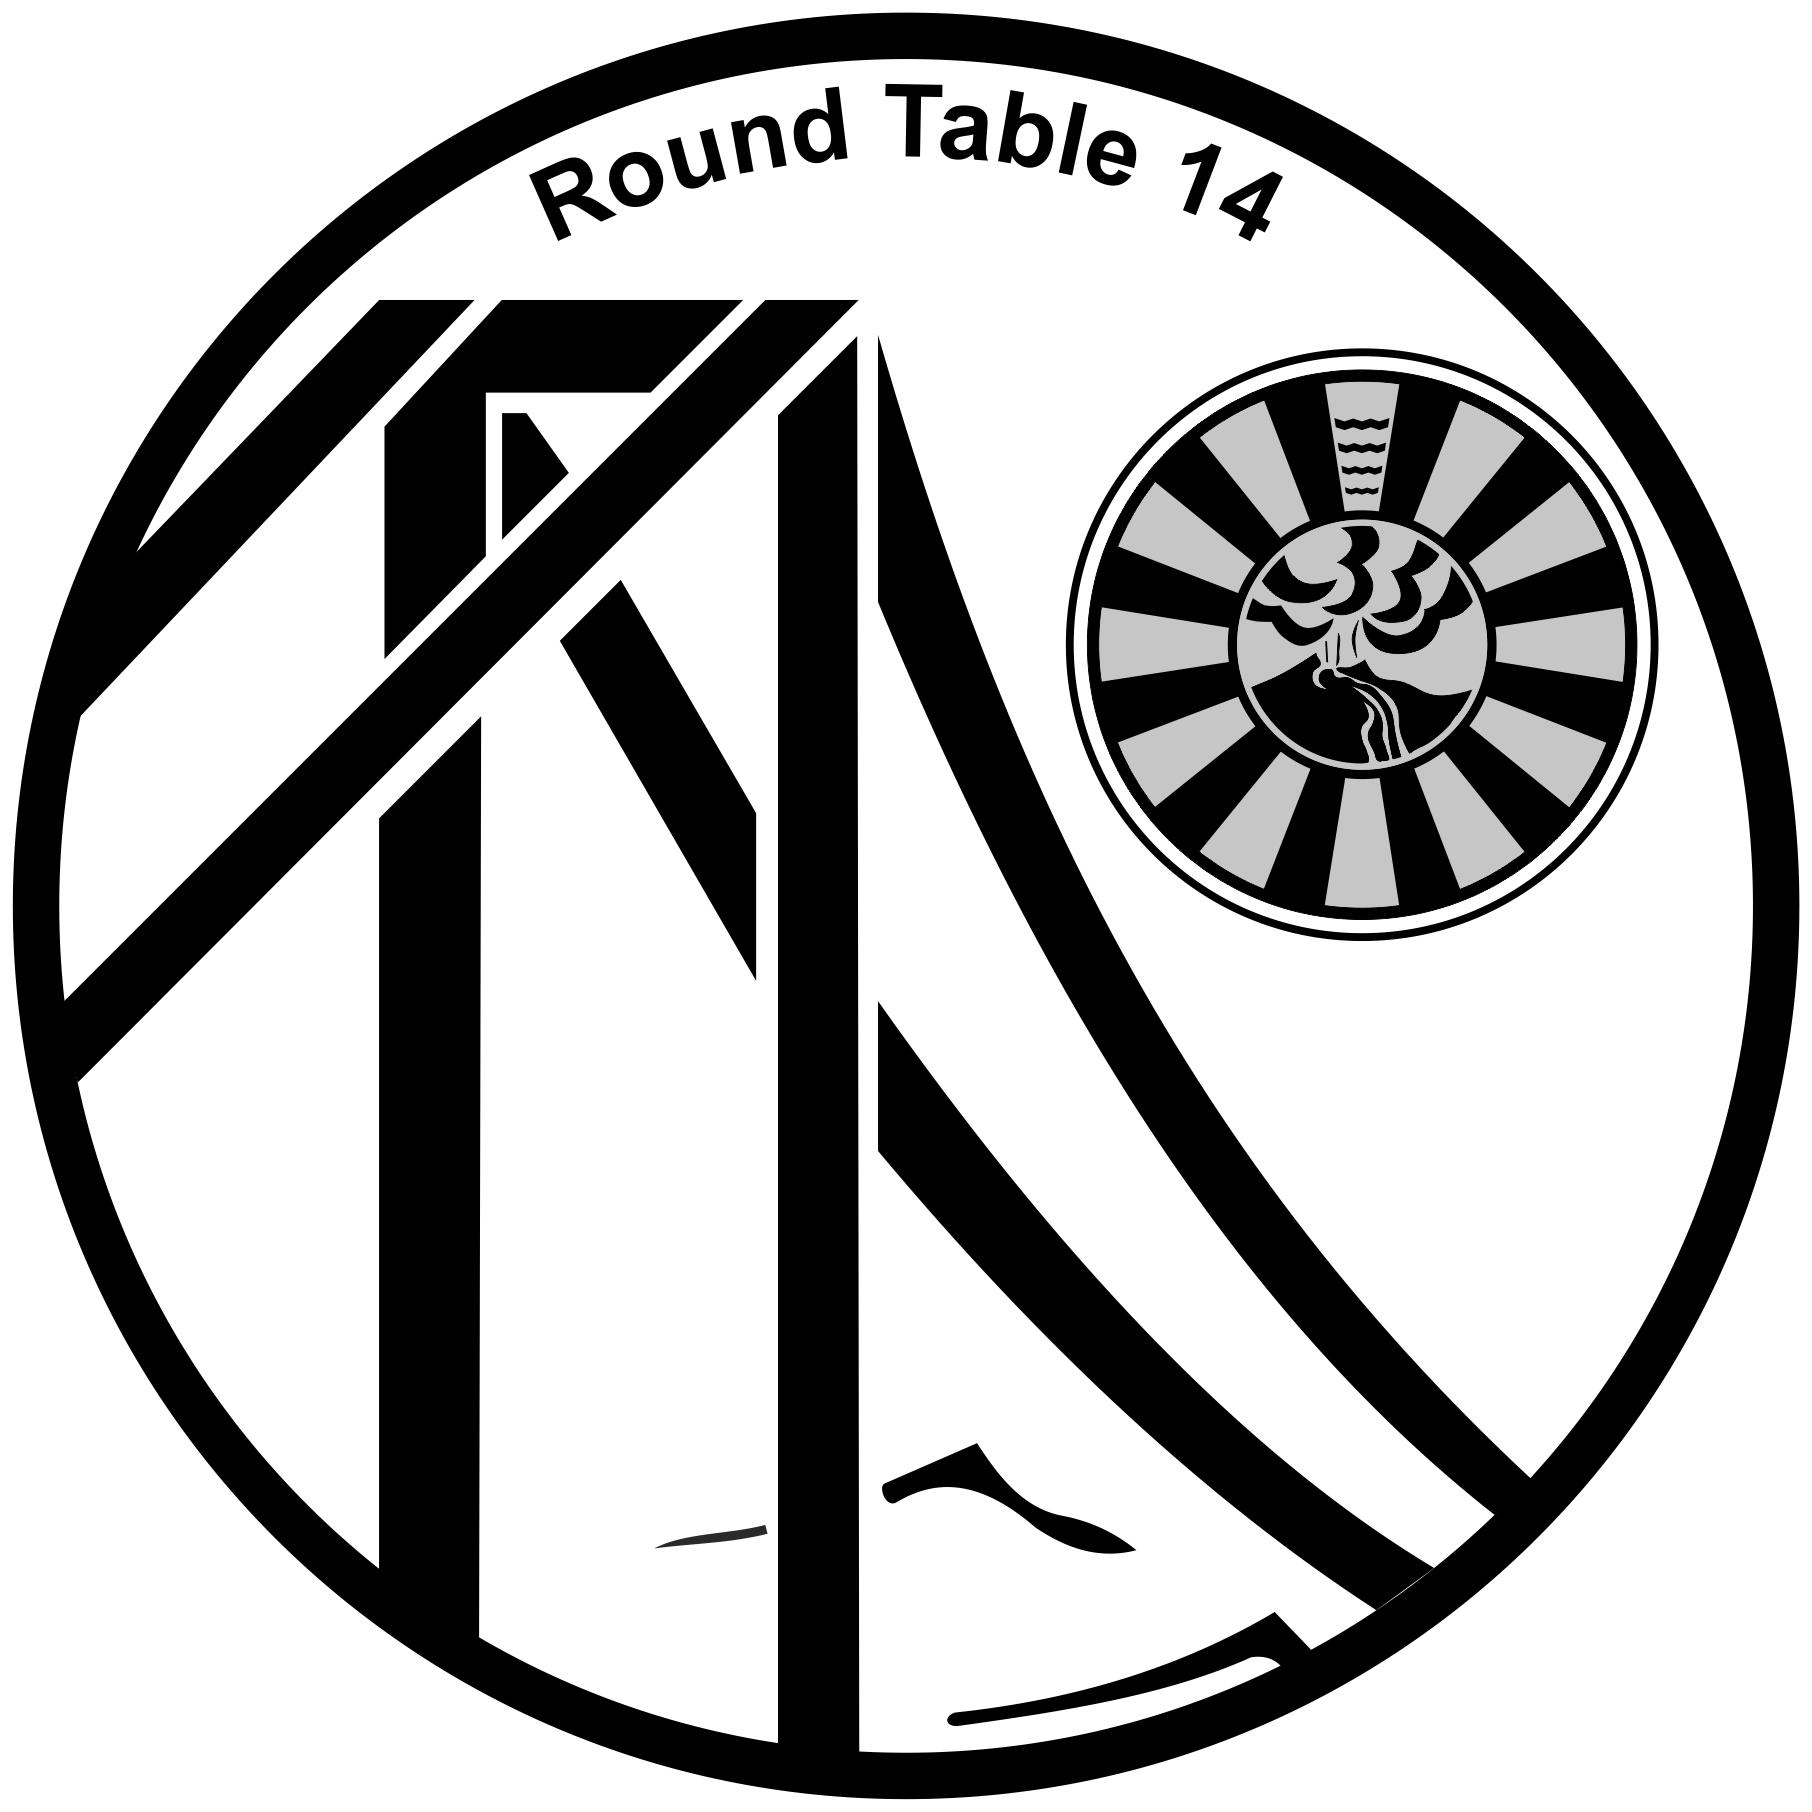 Round Table 14 – Selfoss